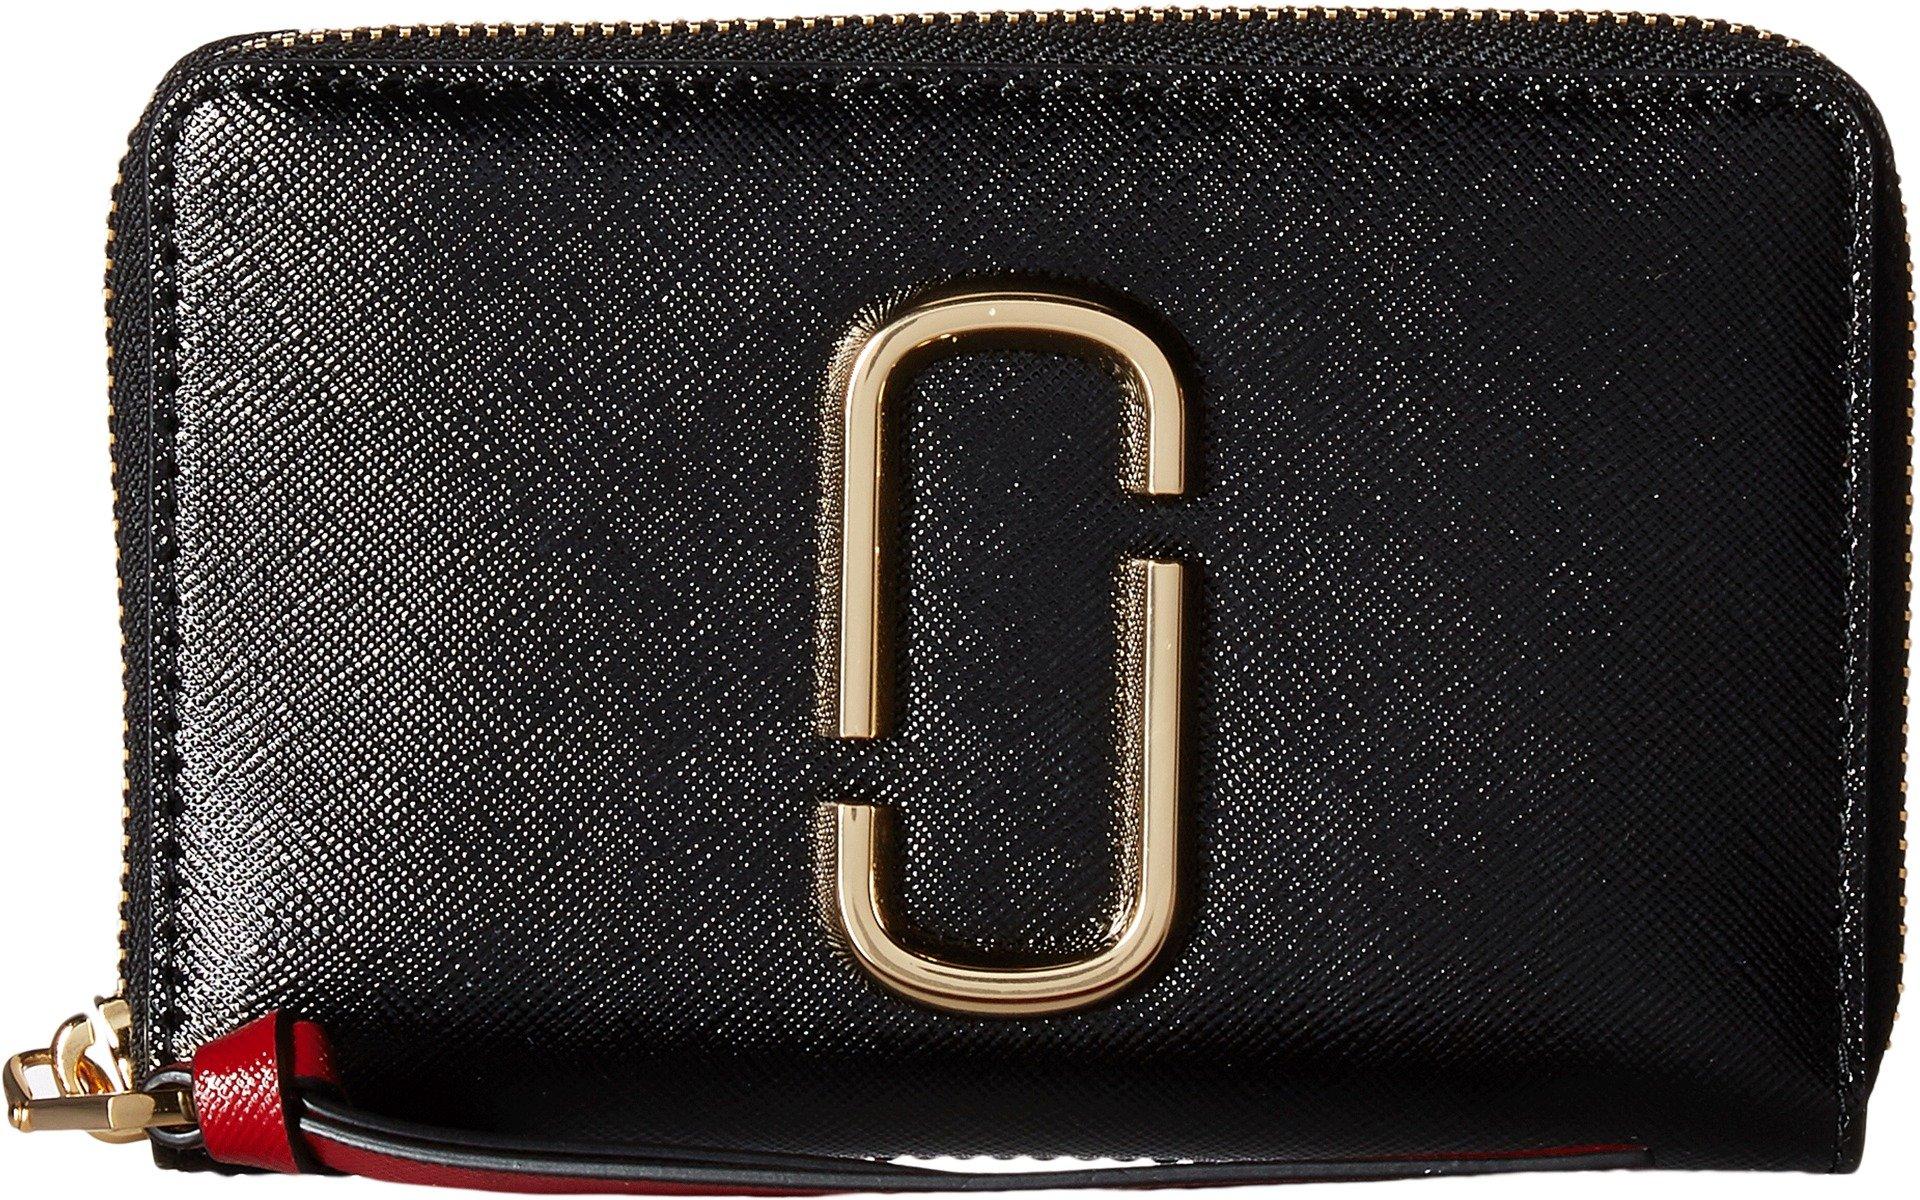 Marc Jacobs Women's Snapshot Small Standard Wallet, Black/Chianti, One Size